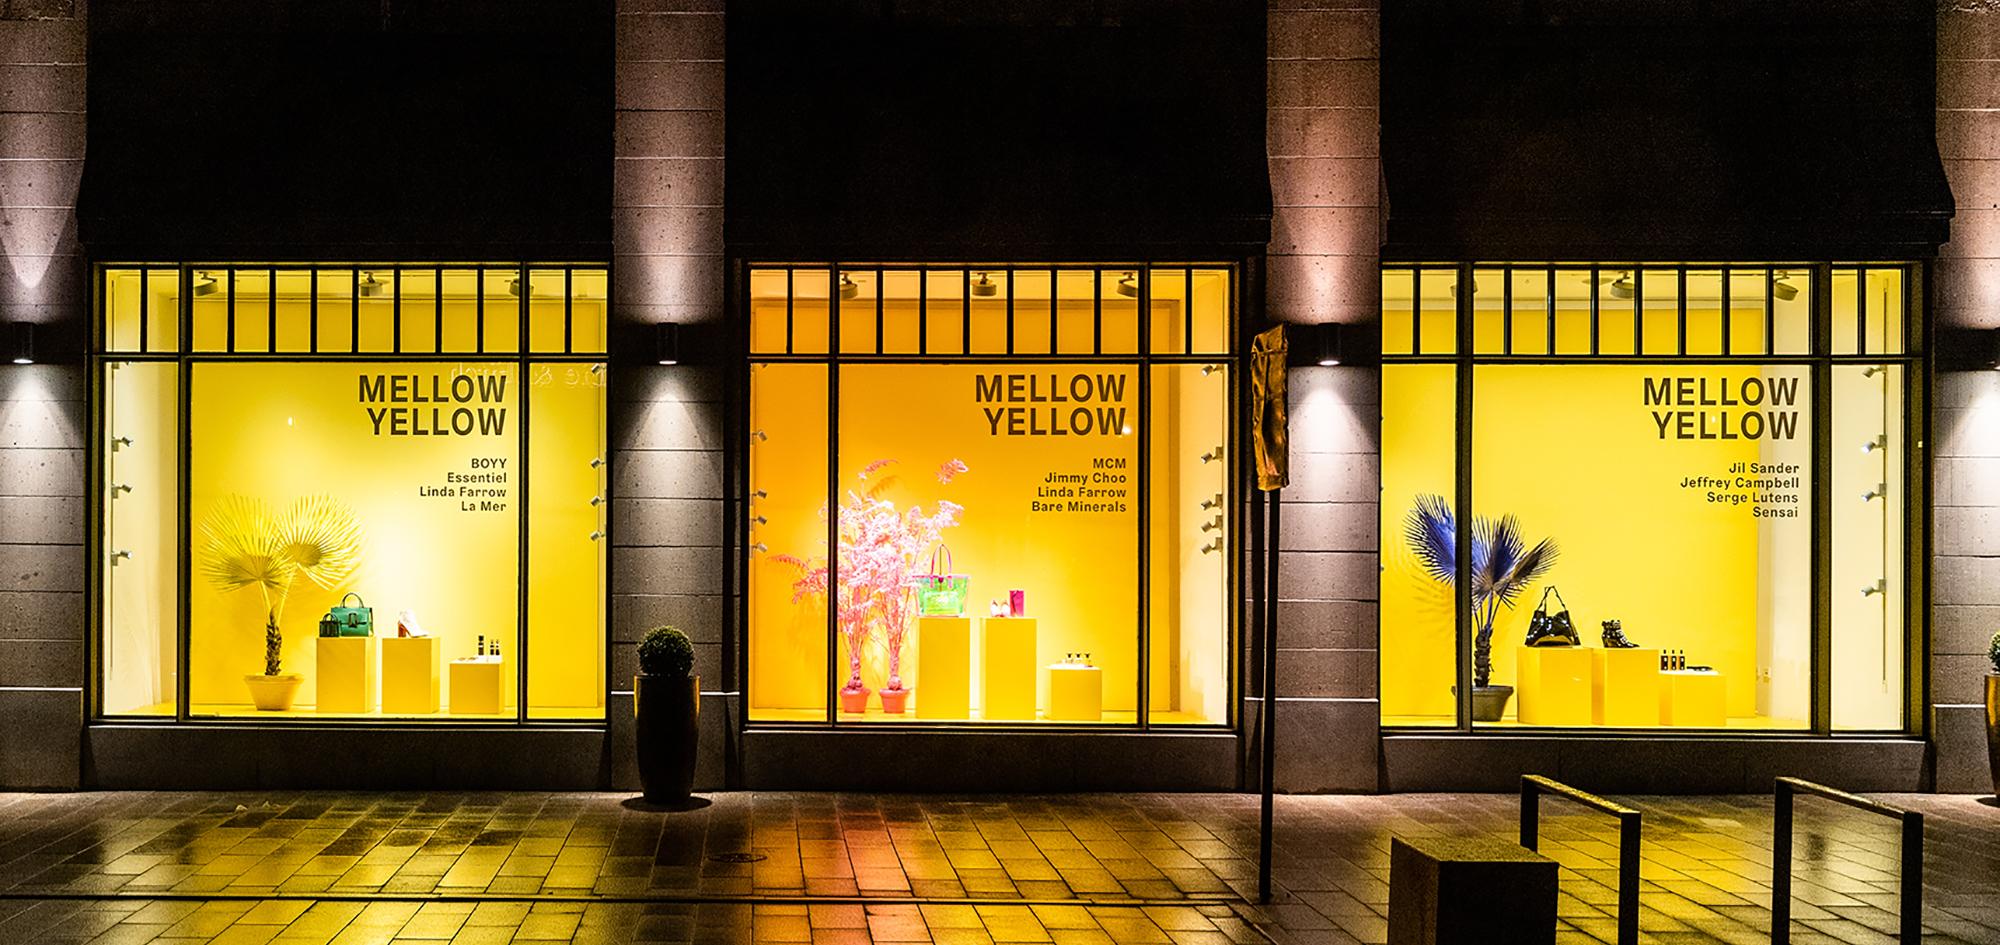 XL-Teaser_mellow-Yellow-pop-up-Accessoires-fashion-Alsterhaus-luxus